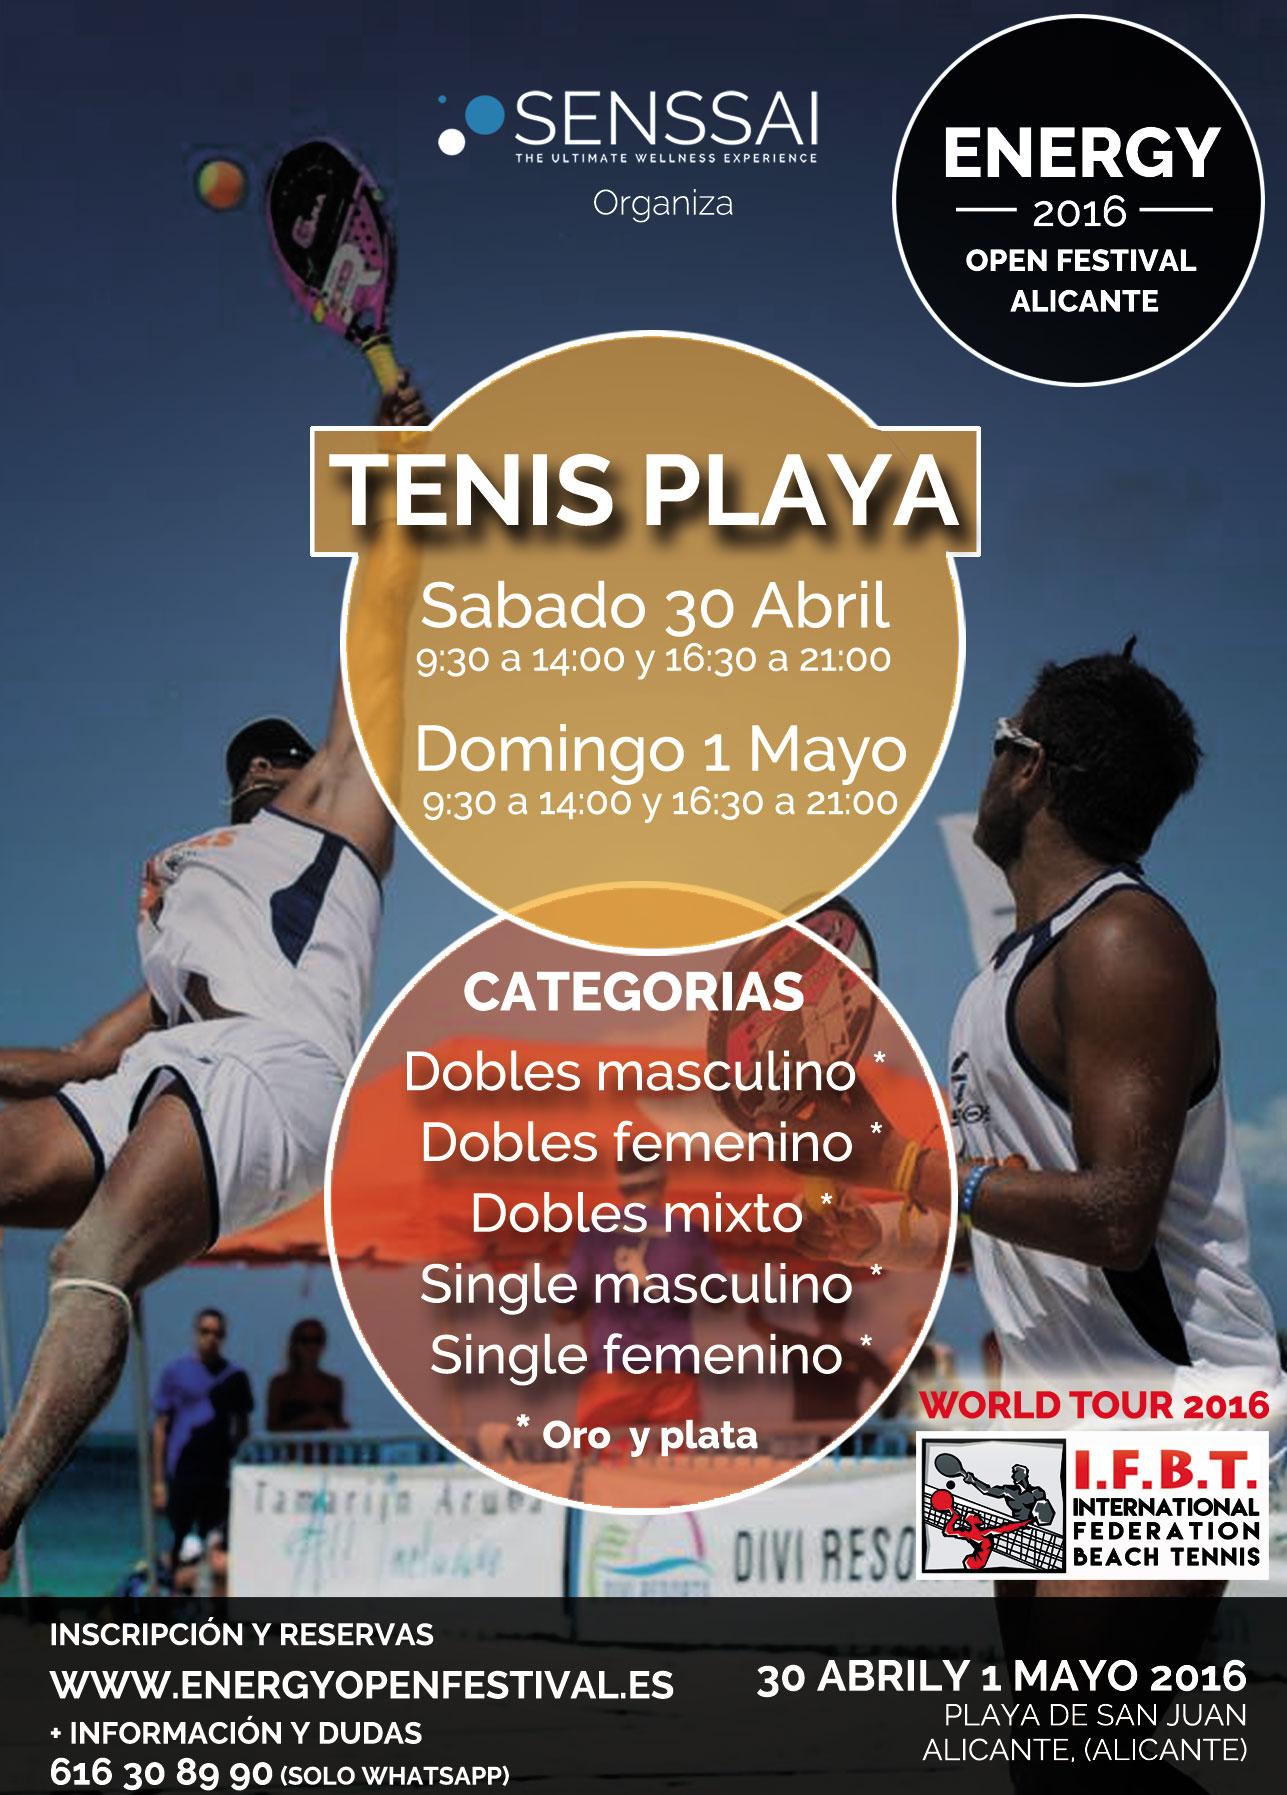 flyer-energy2016-tenis